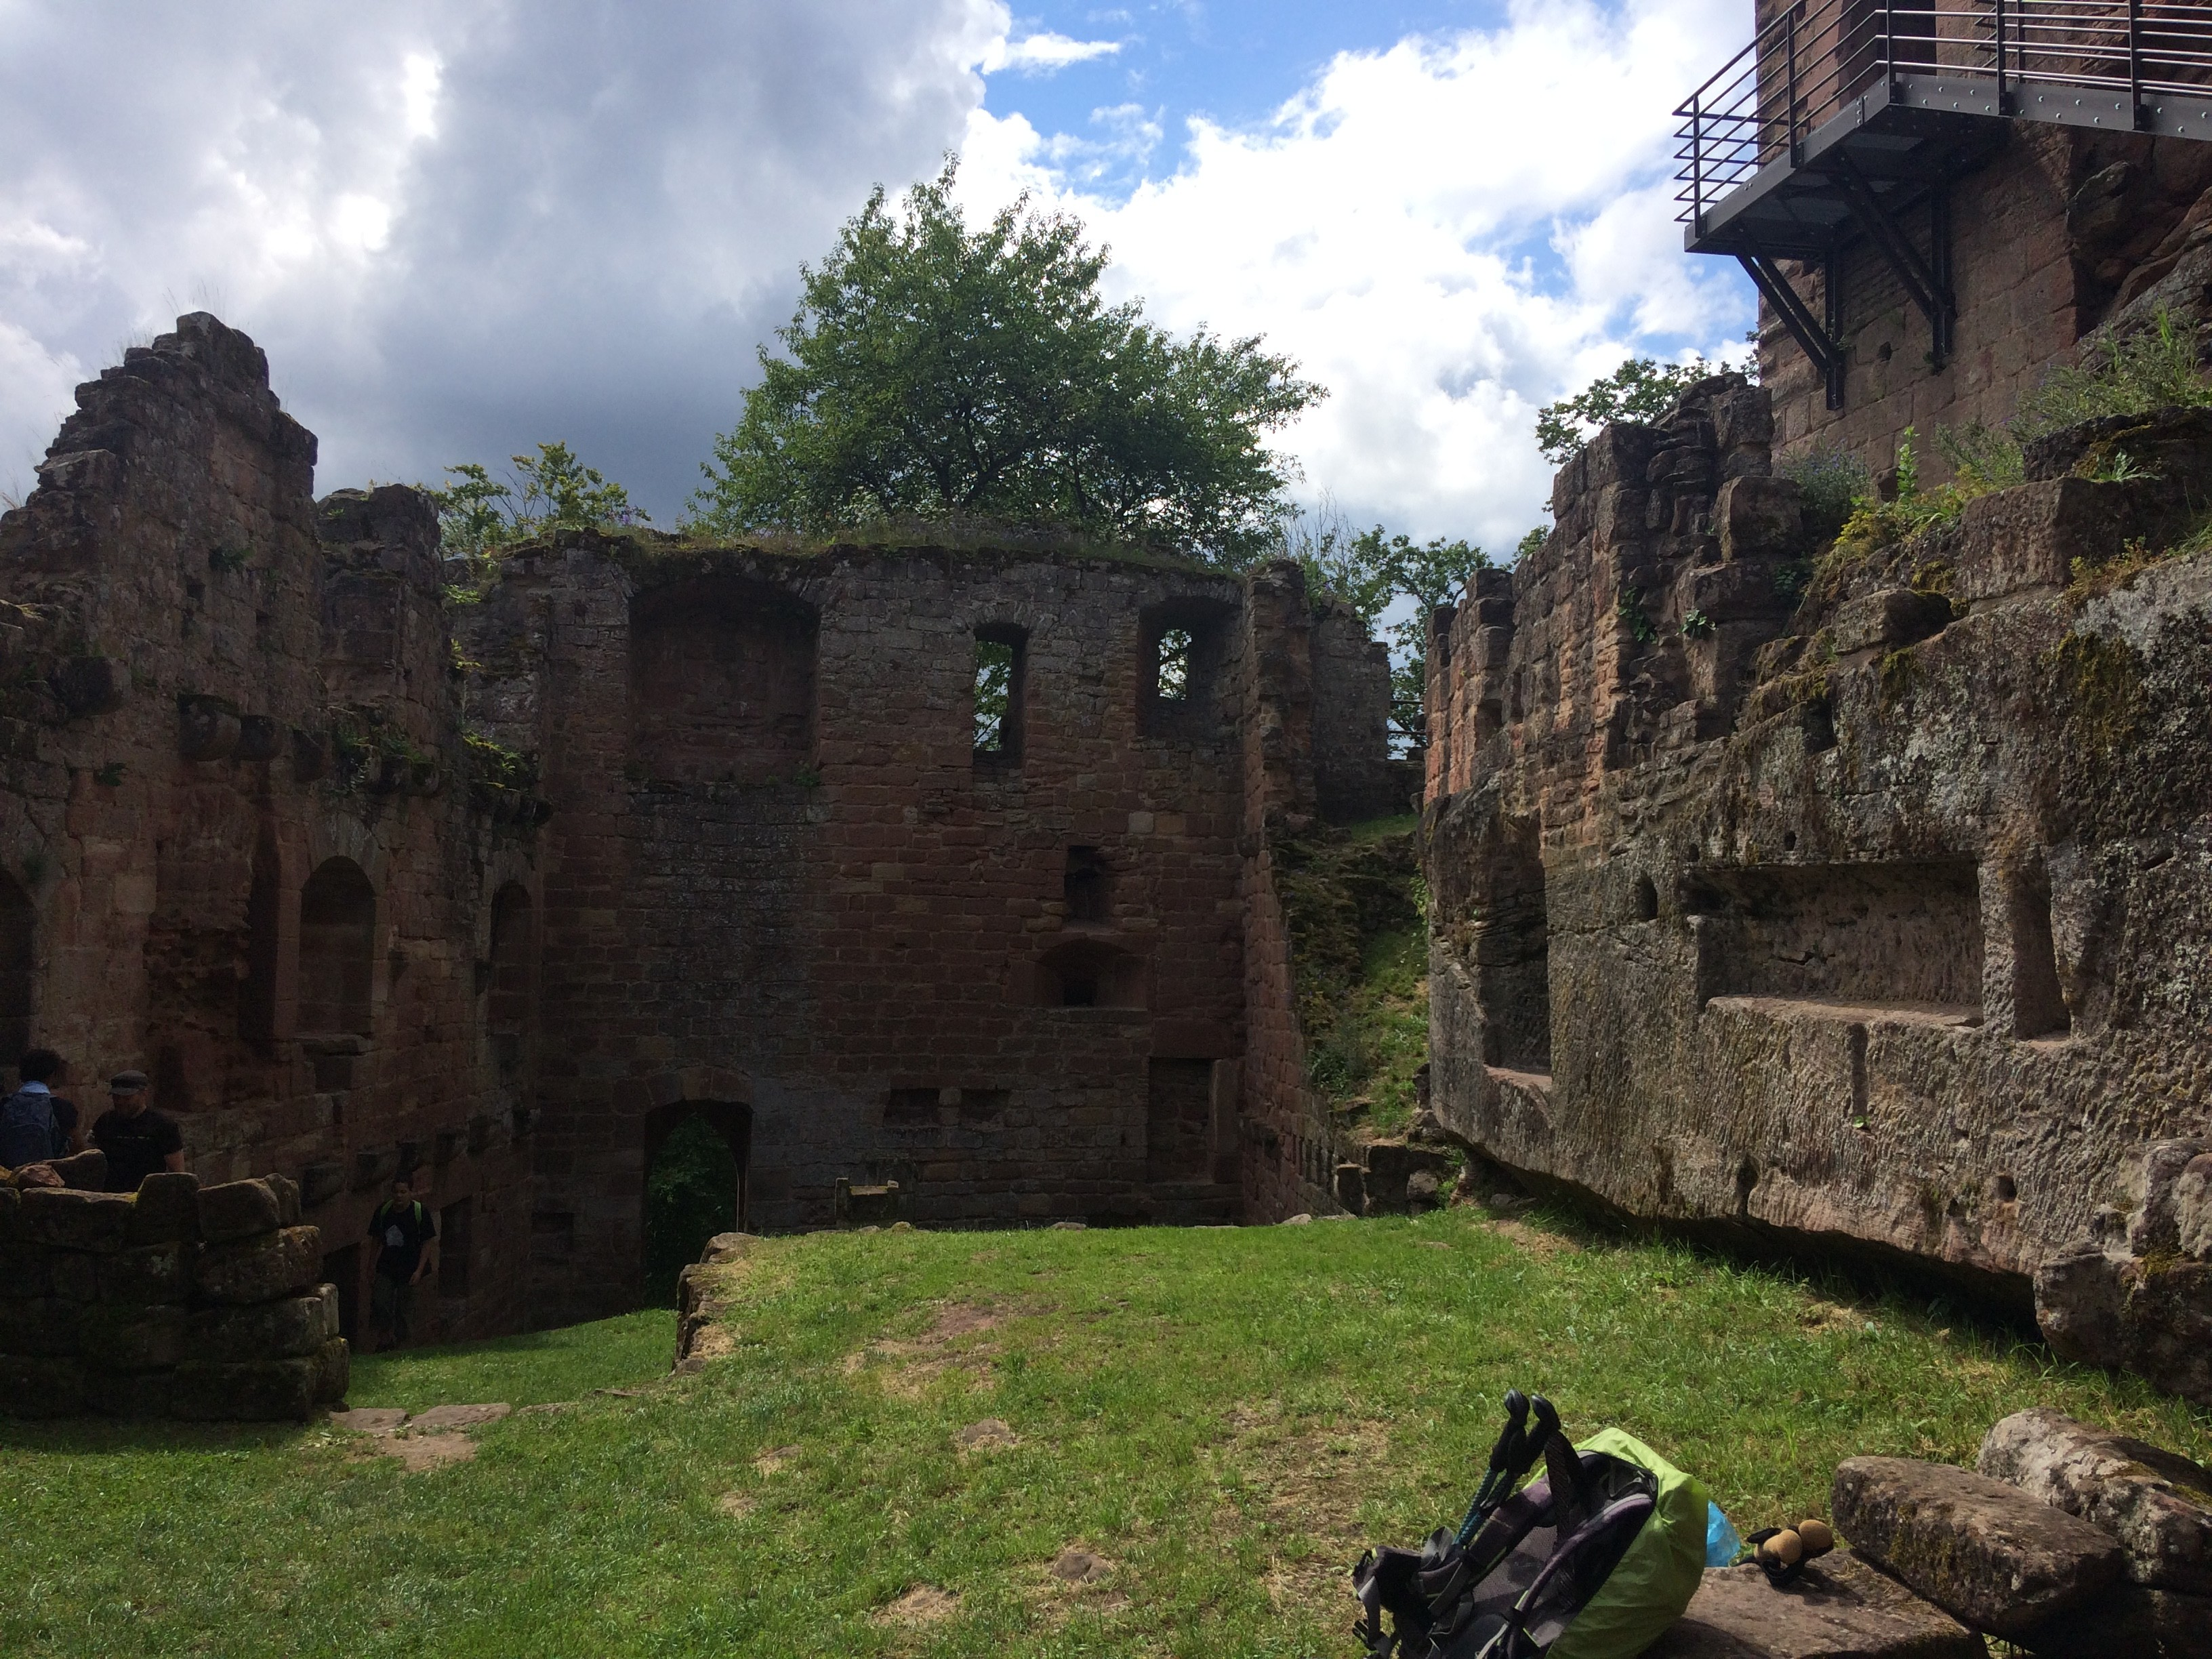 Vue intérieure ruine nouveau Windstein